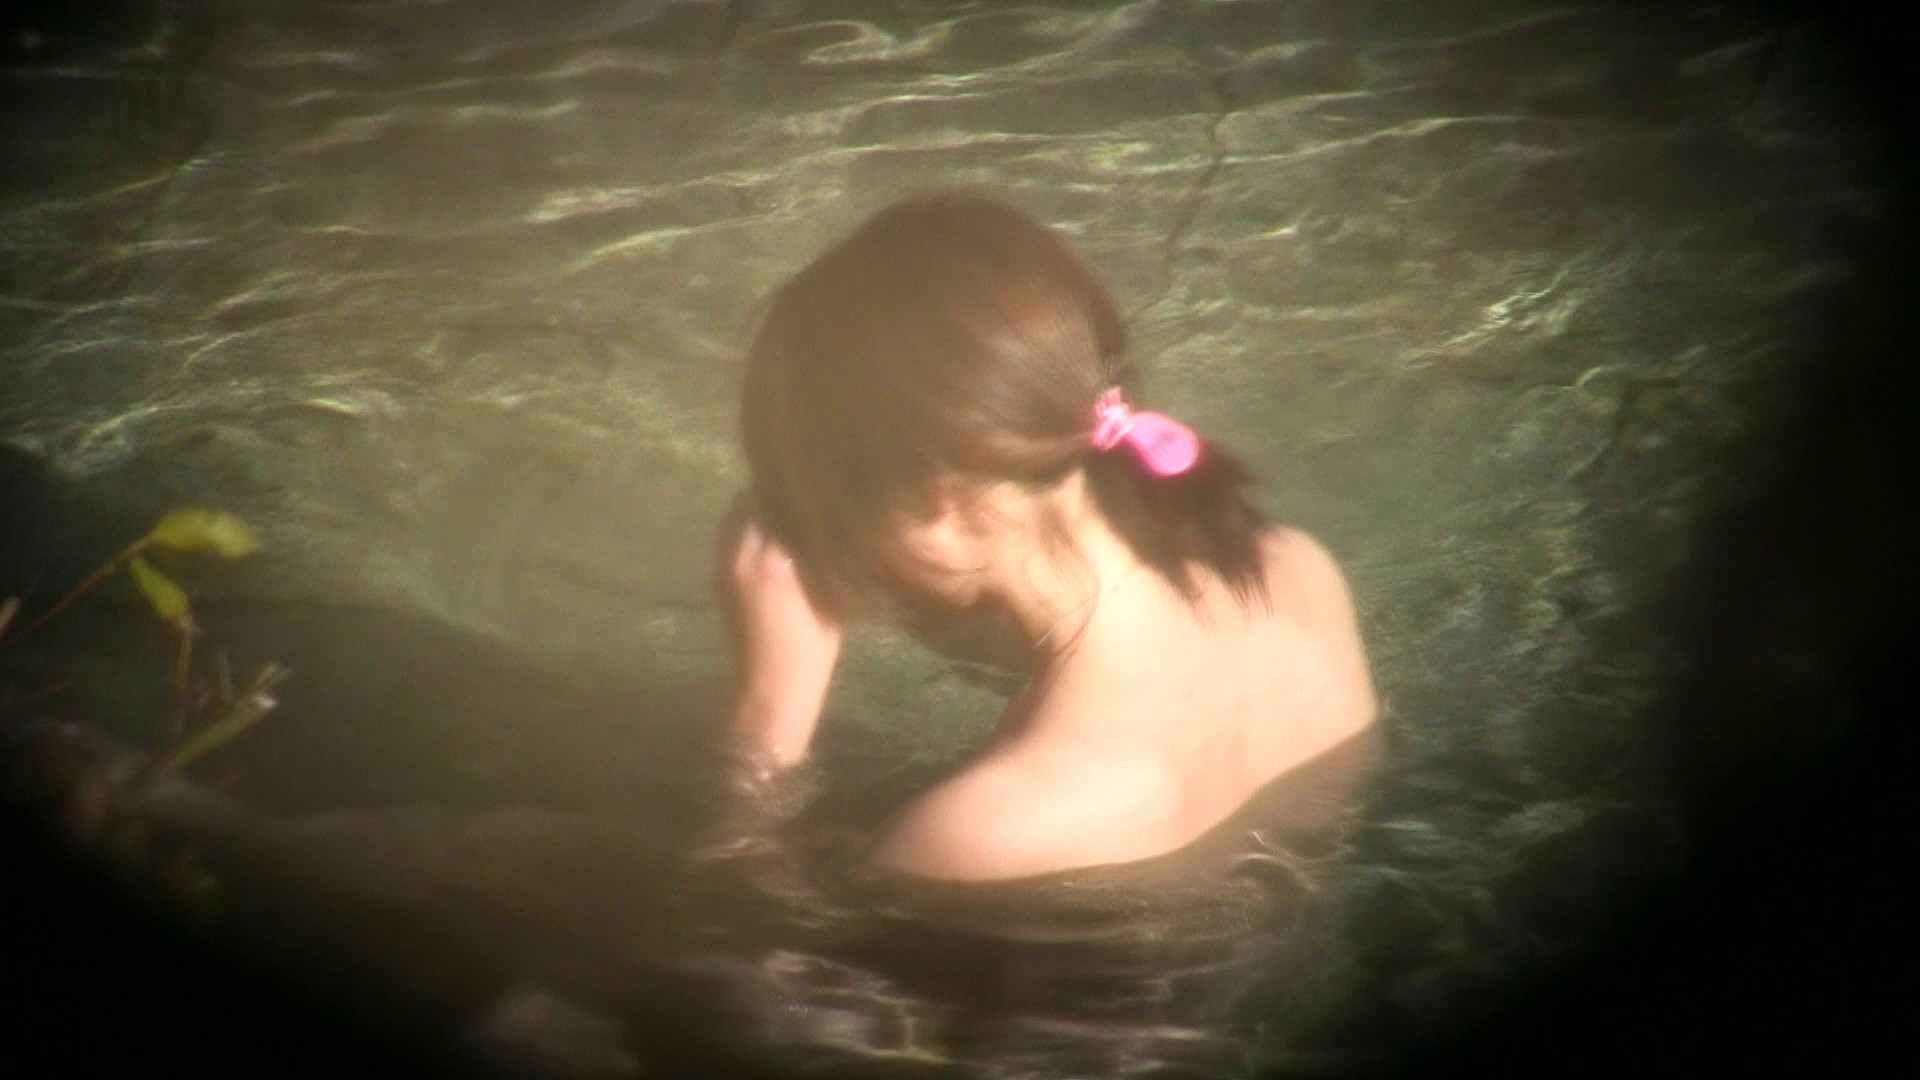 Aquaな露天風呂Vol.698 盗撮 | HなOL  86pic 41